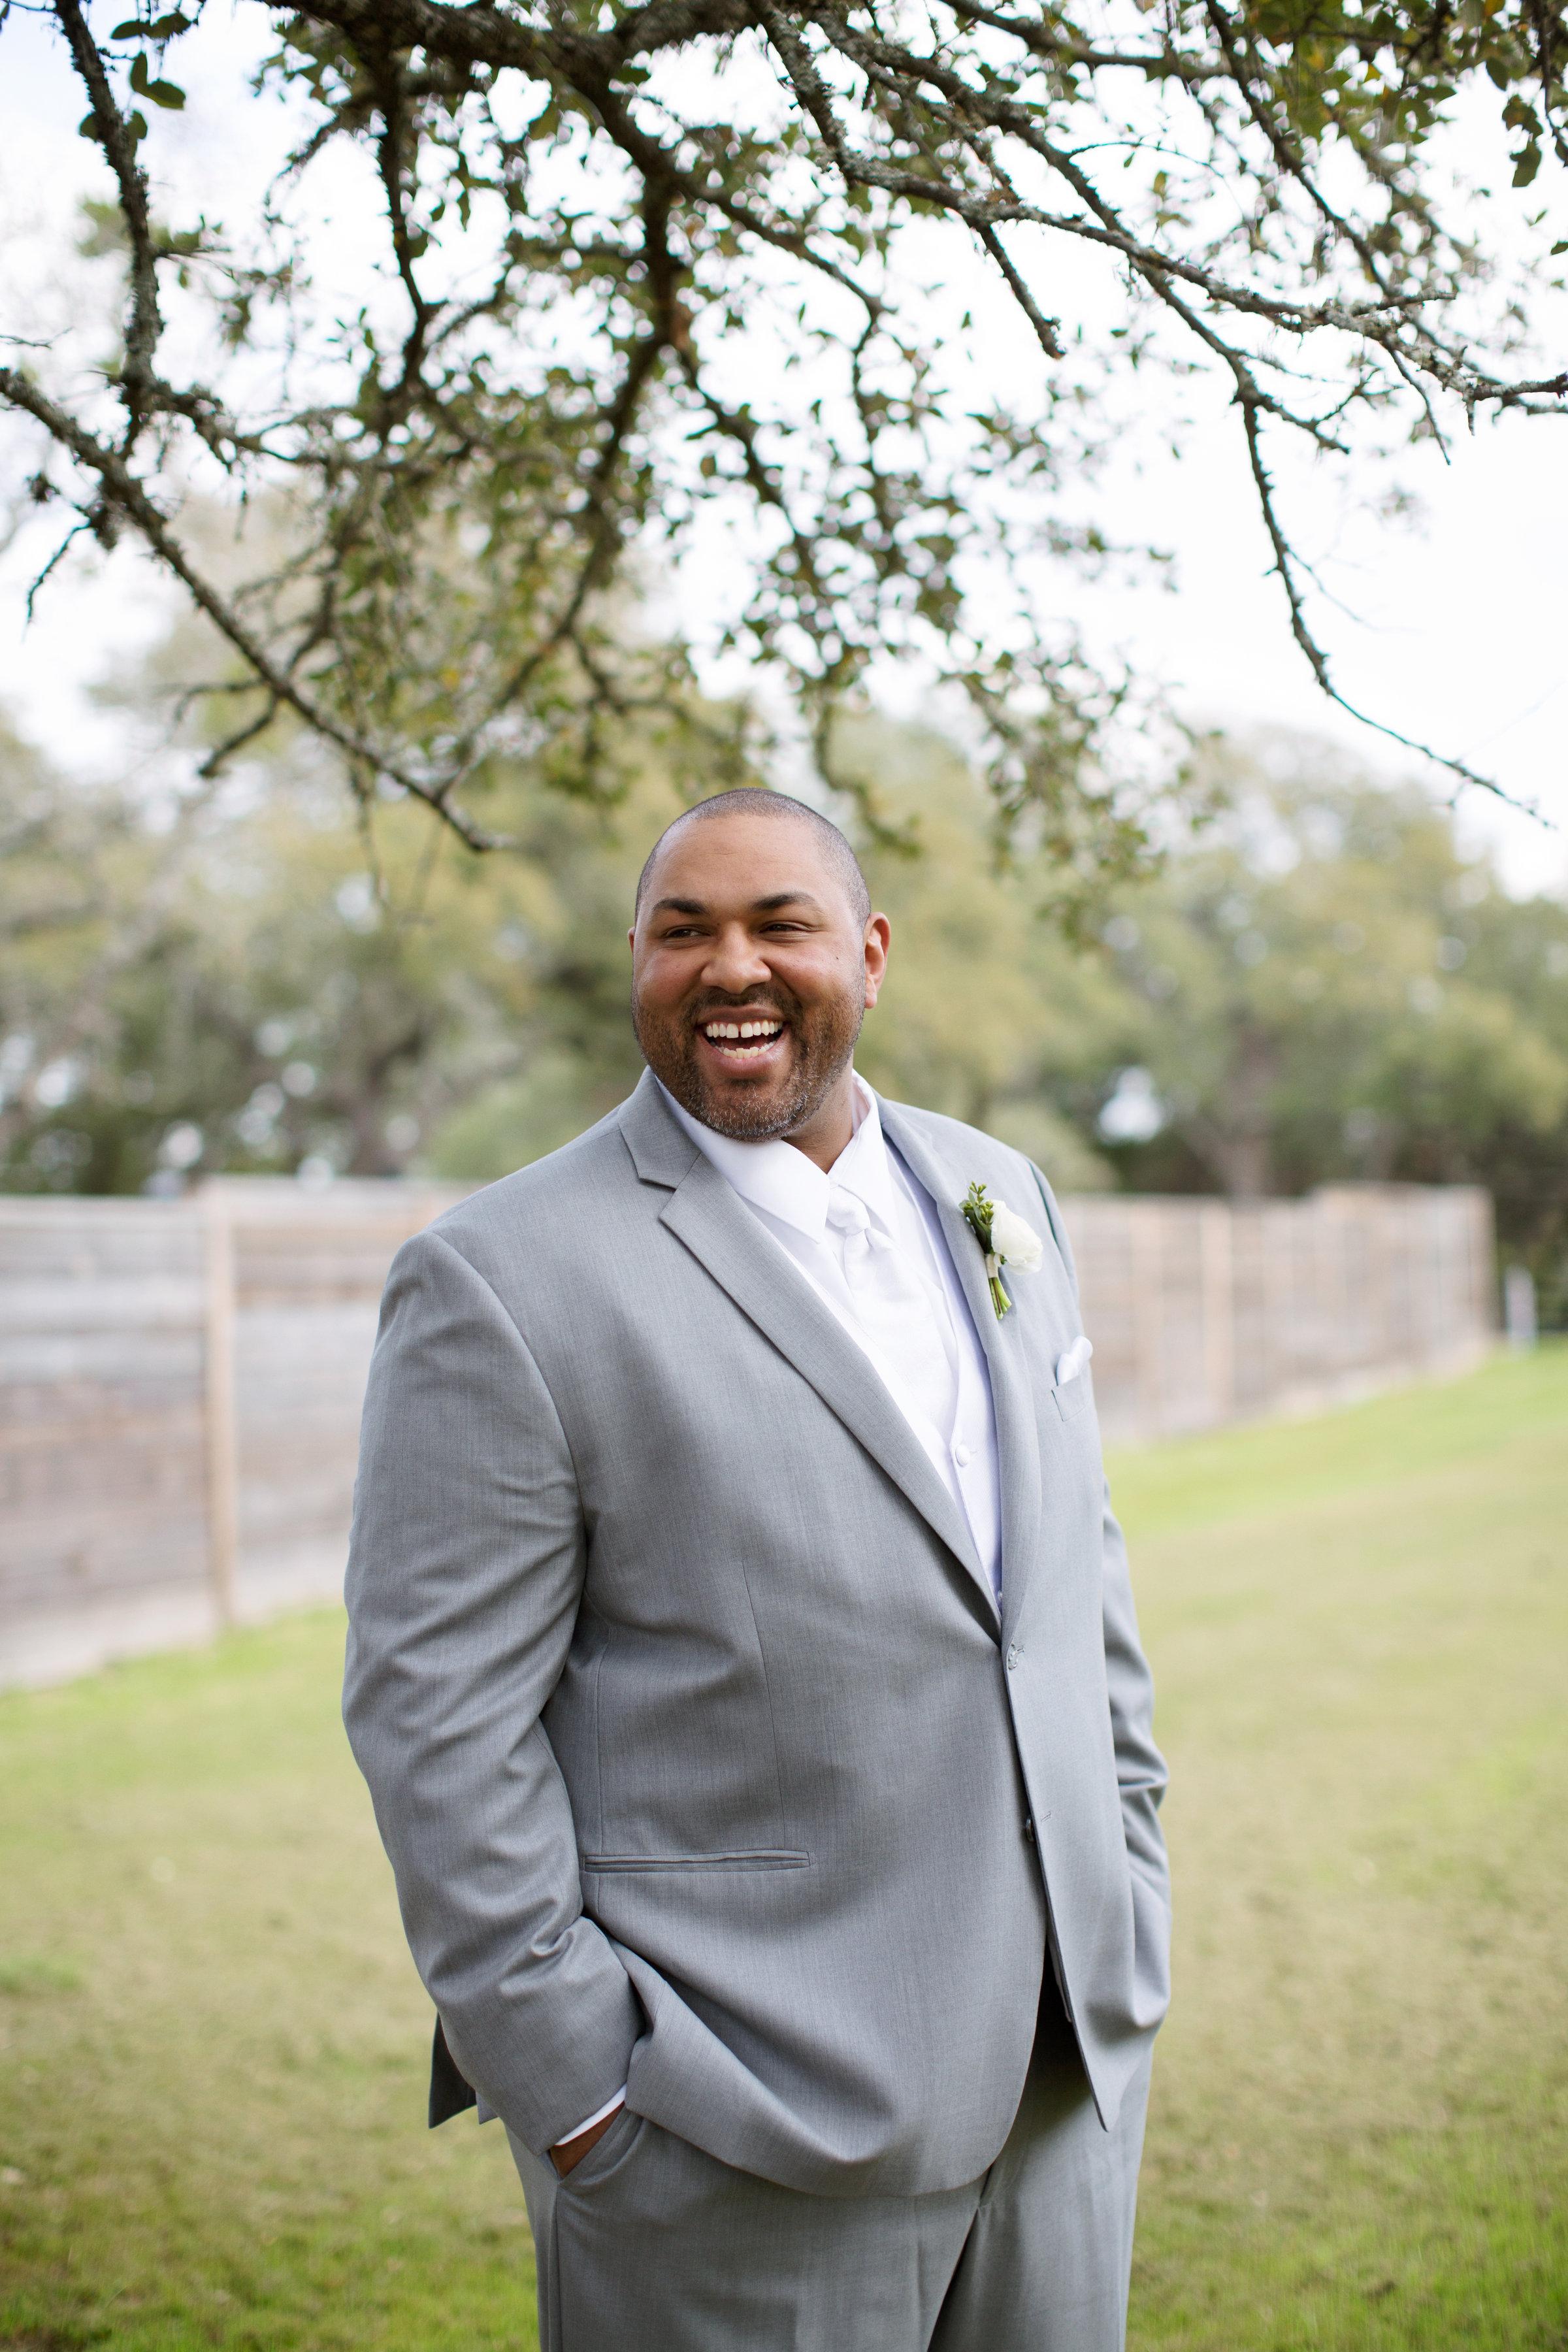 Ma Maison Austin Wedding Venue_ Austin Wedding Planner Heavenly Day Events _ Kristi Wright Austin Wedding Photographer20160306_0132.JPG